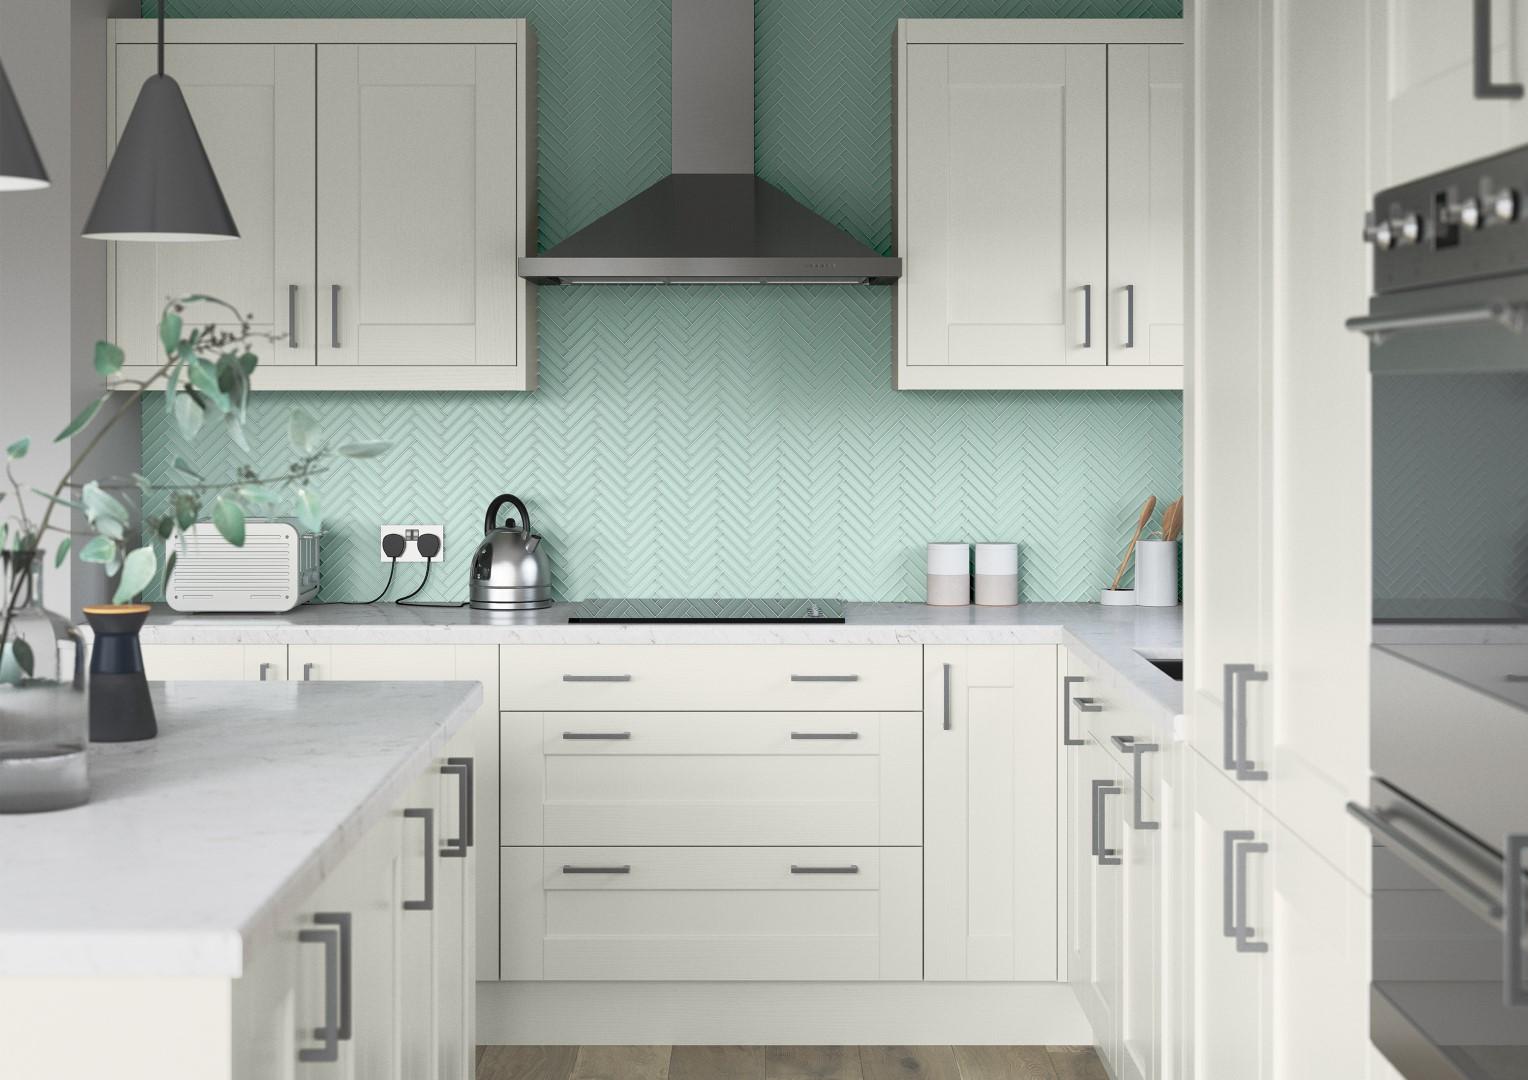 Kensington Porcelain - Kitchen Design - Alan Kelly Kitchens - Waterford - 1